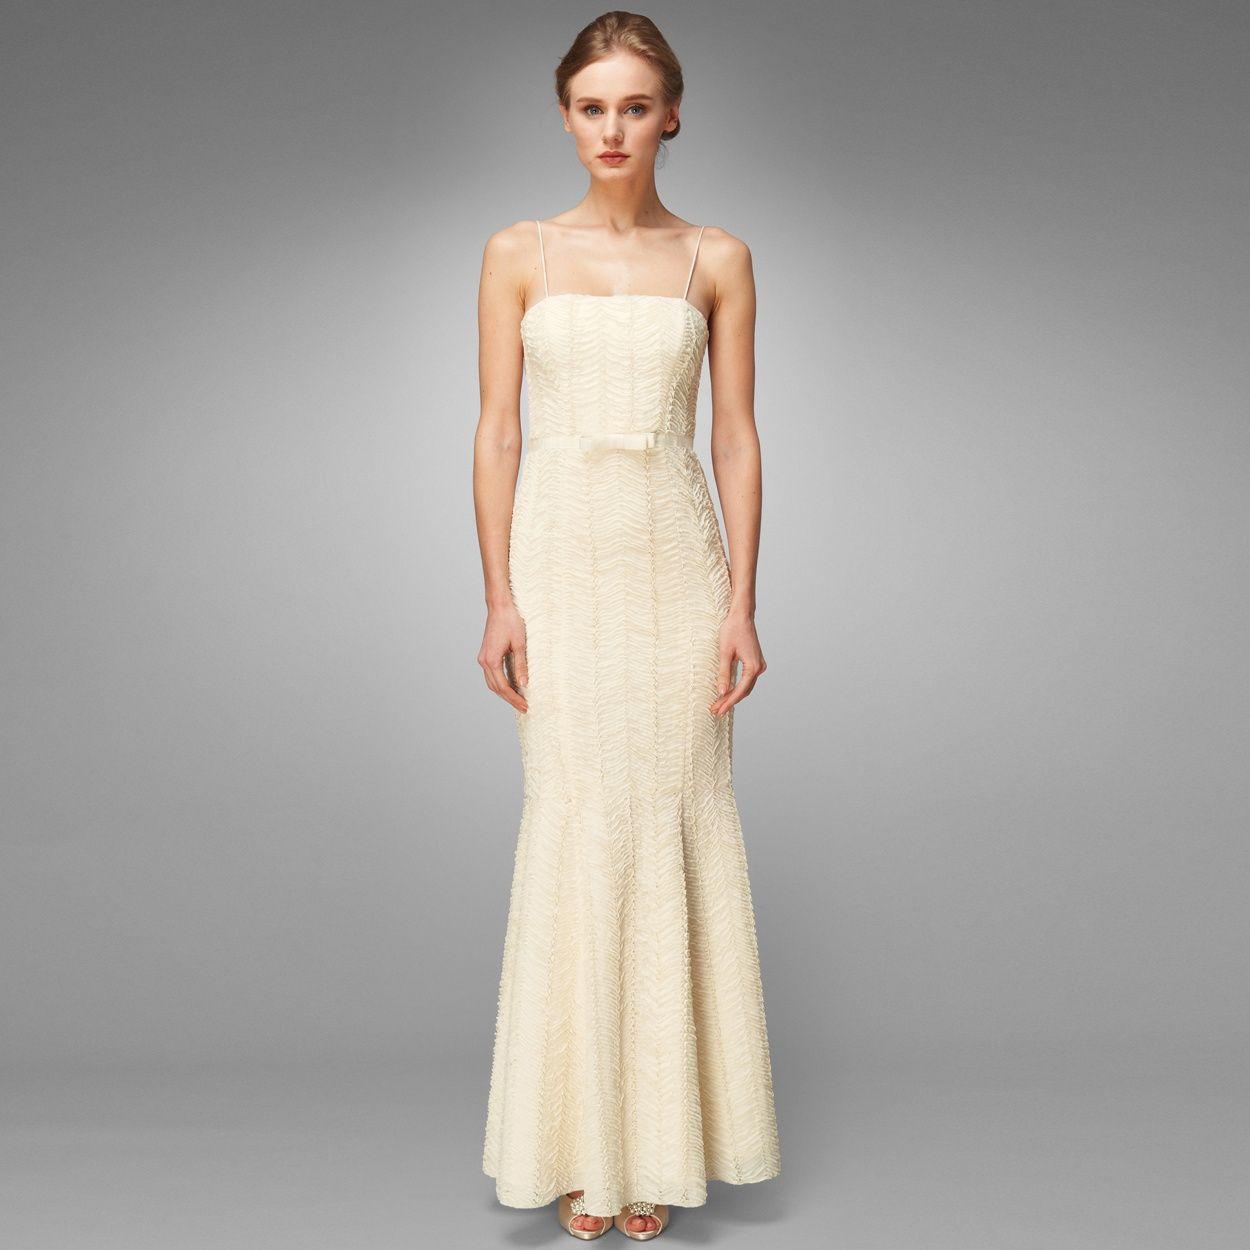 395 Phase Eight Pearl Katherine Wedding Dress At Debenhams Budgetweddingdress